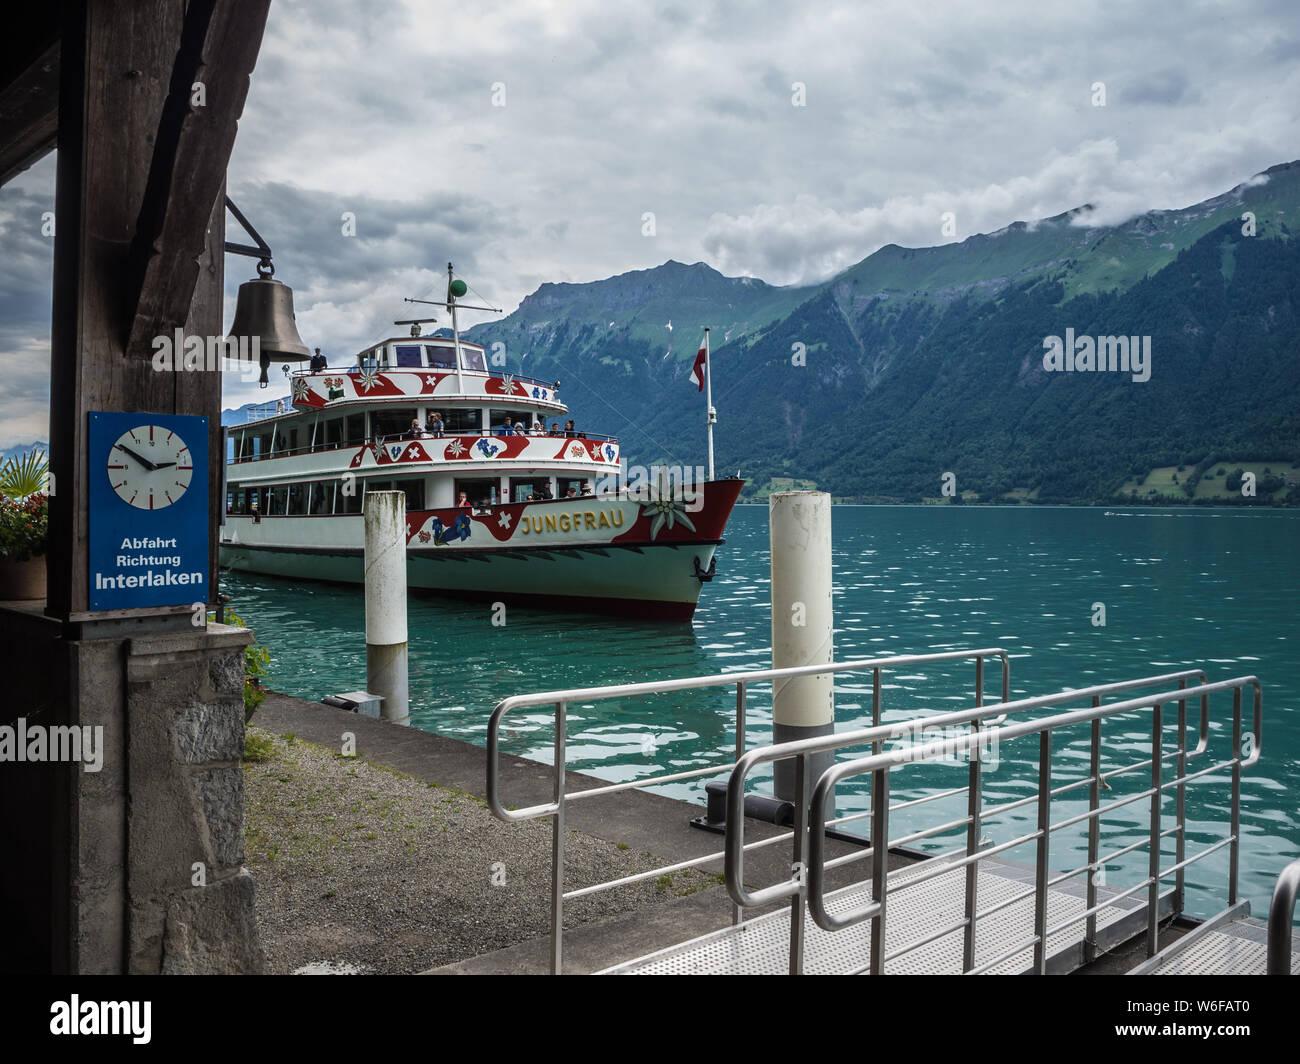 MV Jungfrau on Lake Brienz dropping passengers off at Giessbach falls Stock Photo